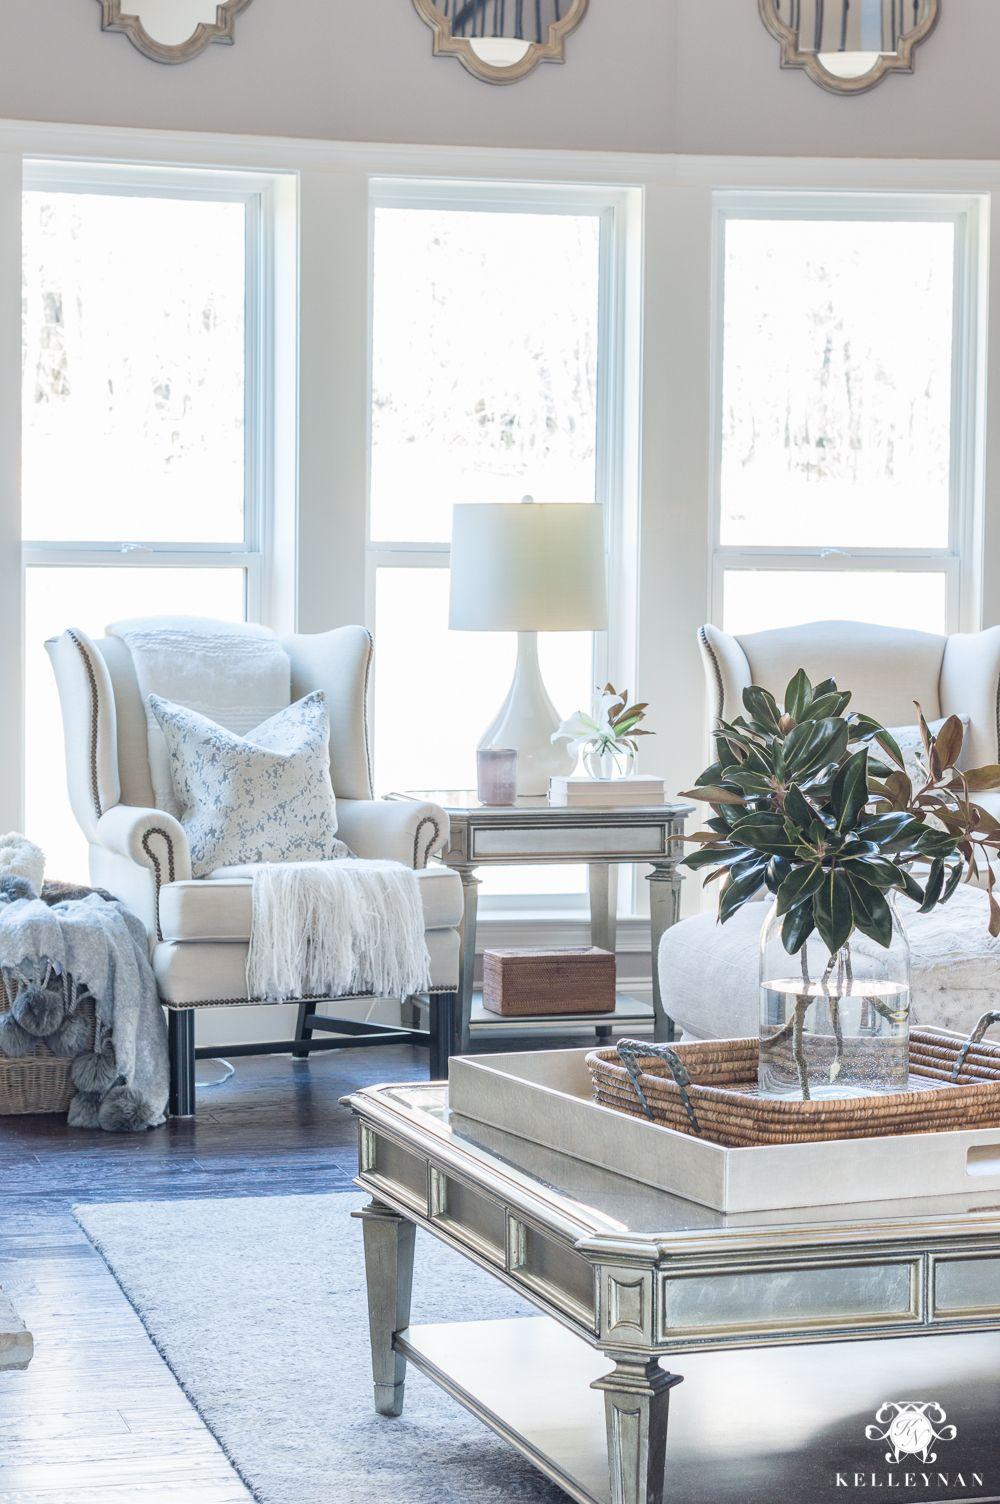 Interior Design Fireplace Living Room: Petal & Lace Co On Divine Design